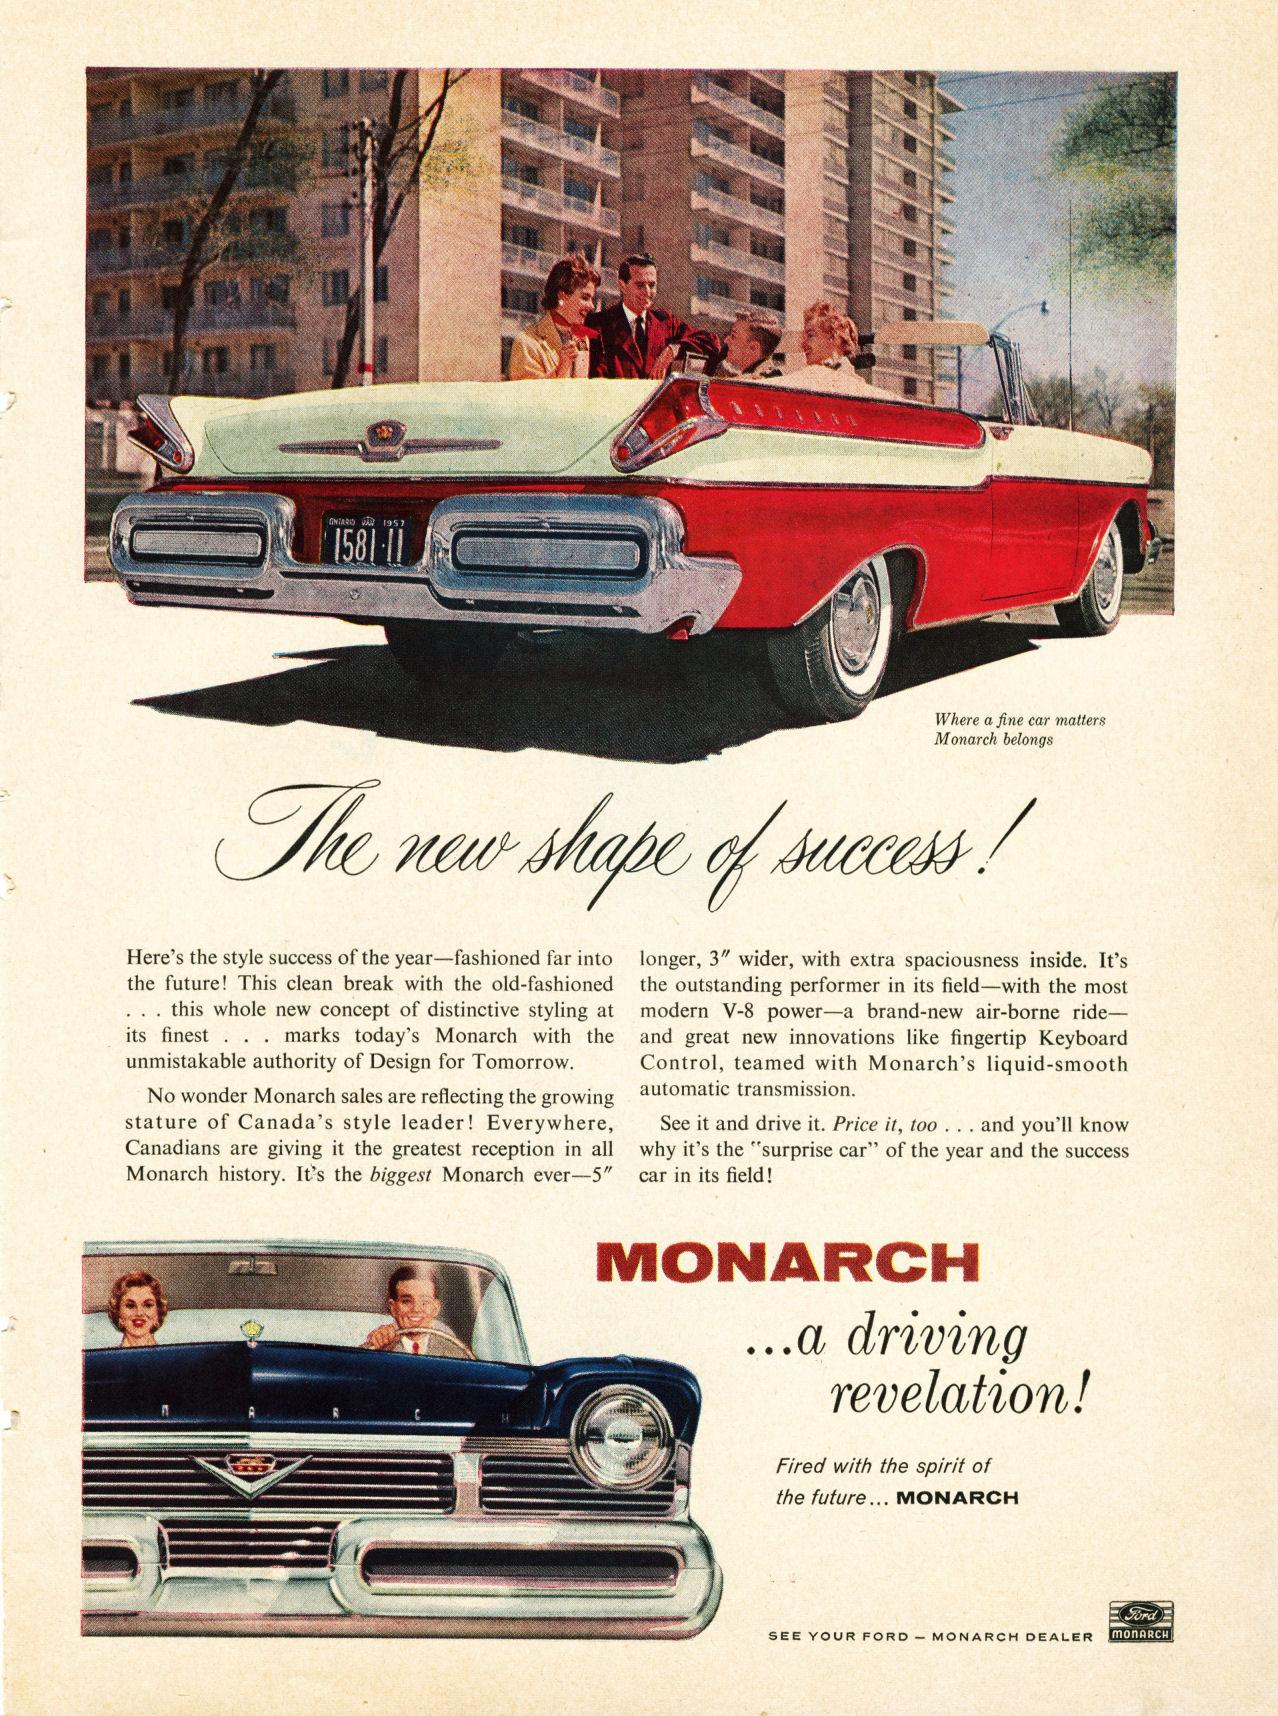 1950s Car Ads on Slot Car Track Wiring Diagram